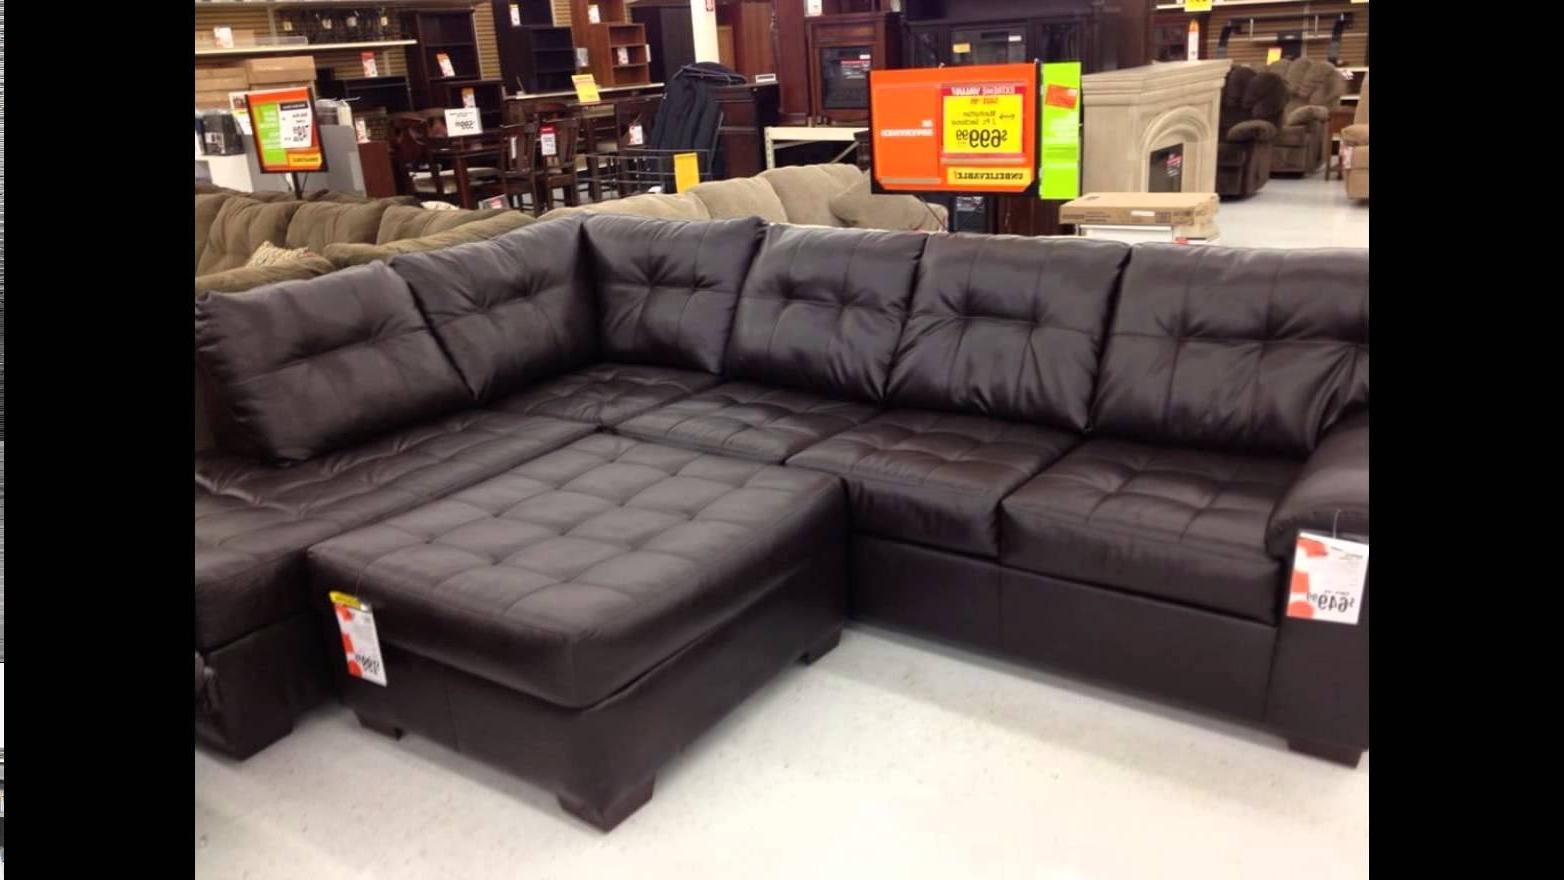 Most Popular Big Lots Furniture Big Lots Furniture Sale – Youtube Regarding Big Lots Sofas (View 10 of 15)